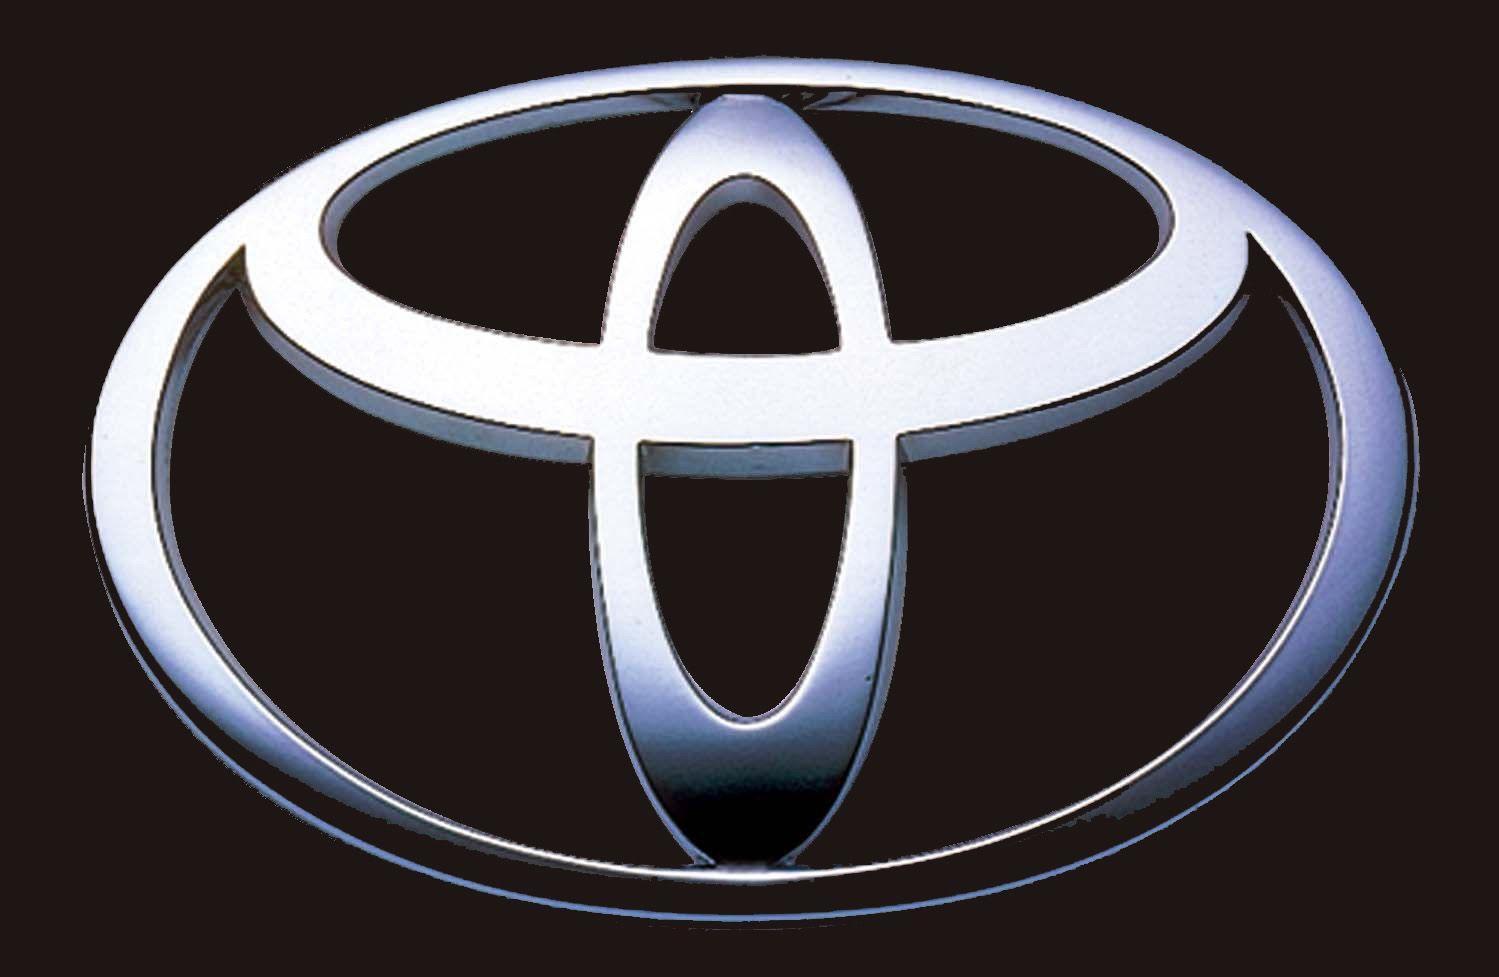 Toyota Logo Wallpaper | Car HD Wallpaper